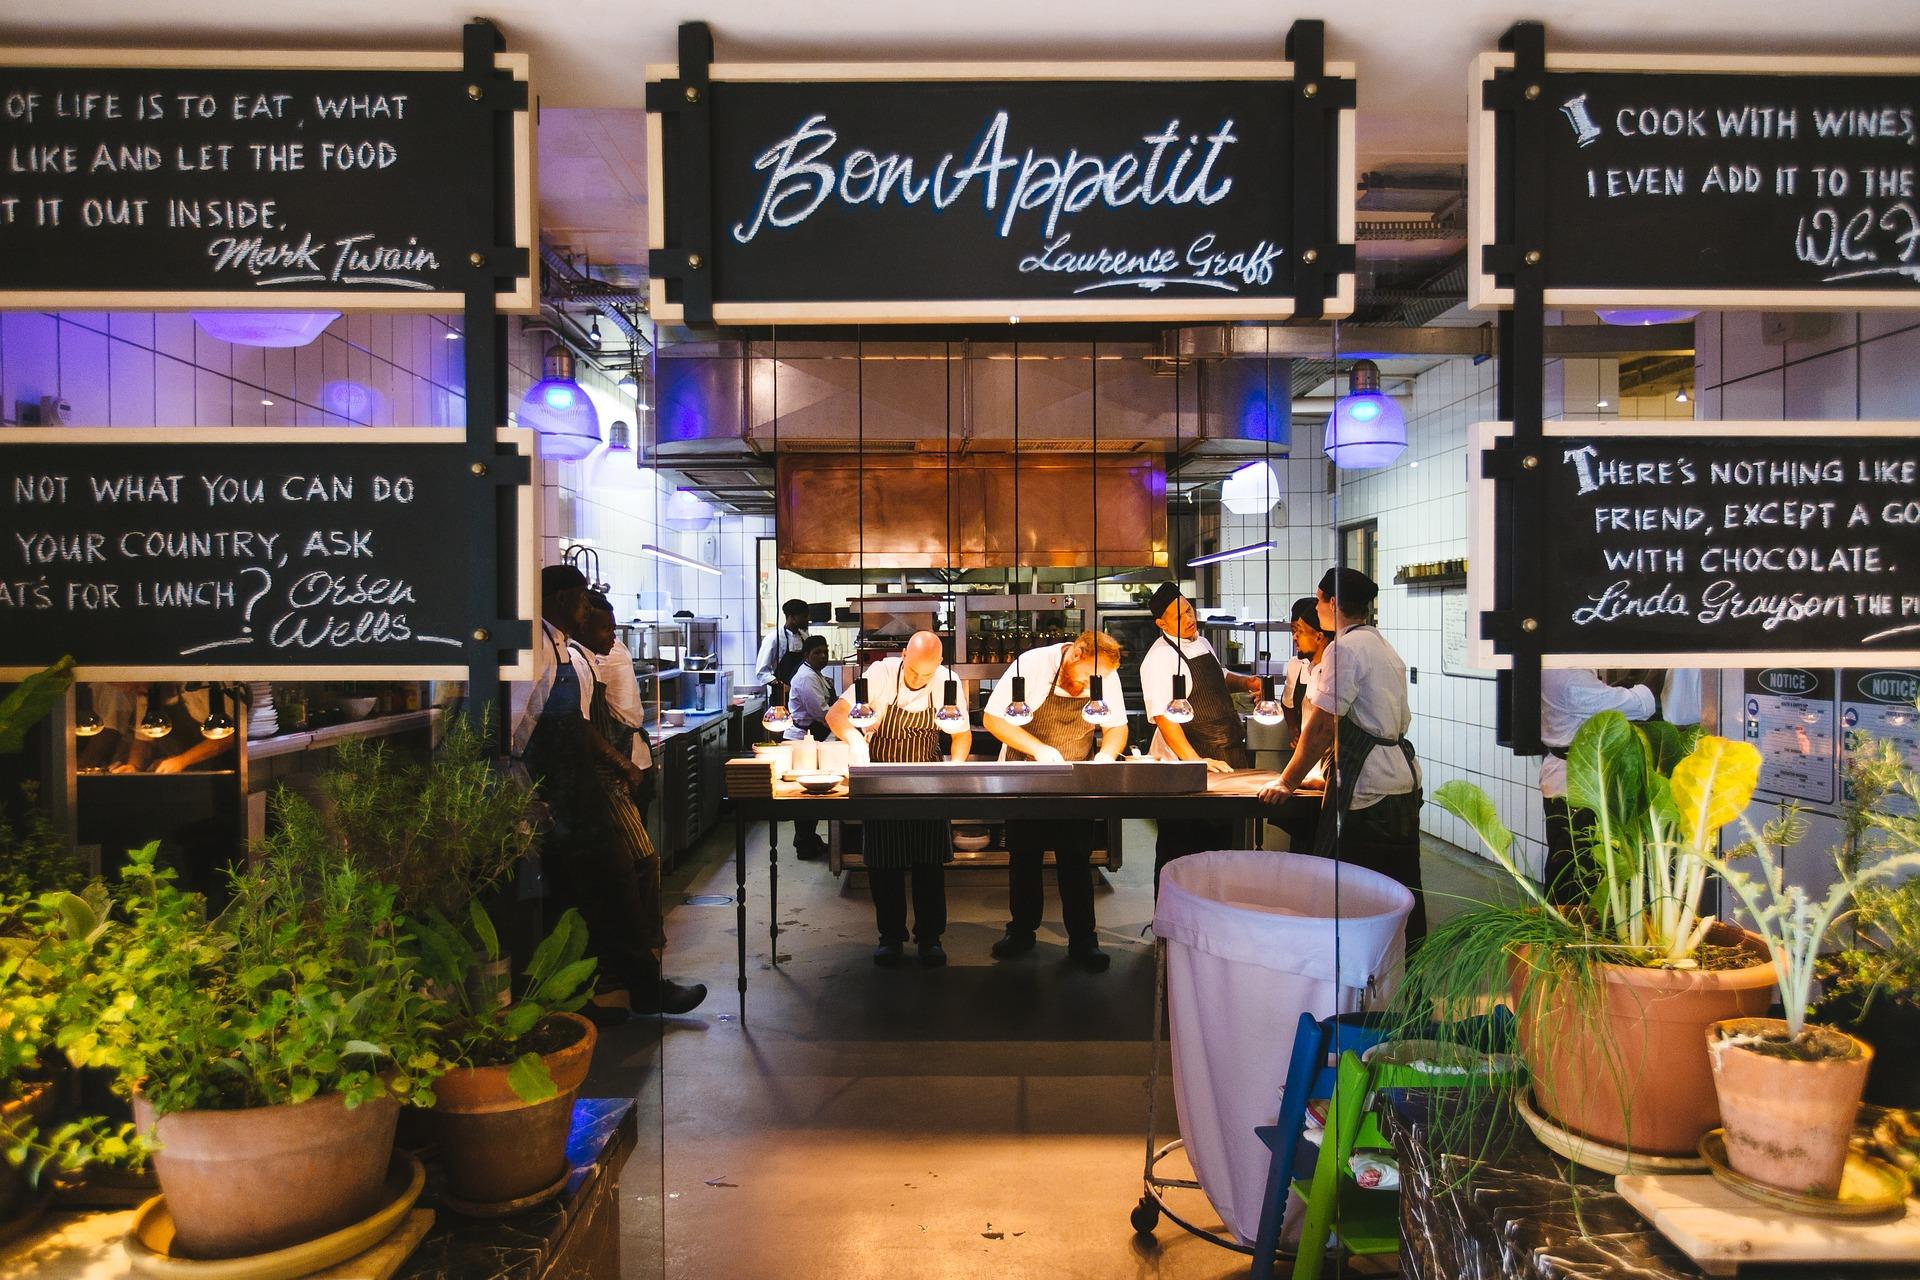 Carte de restaurant digitale